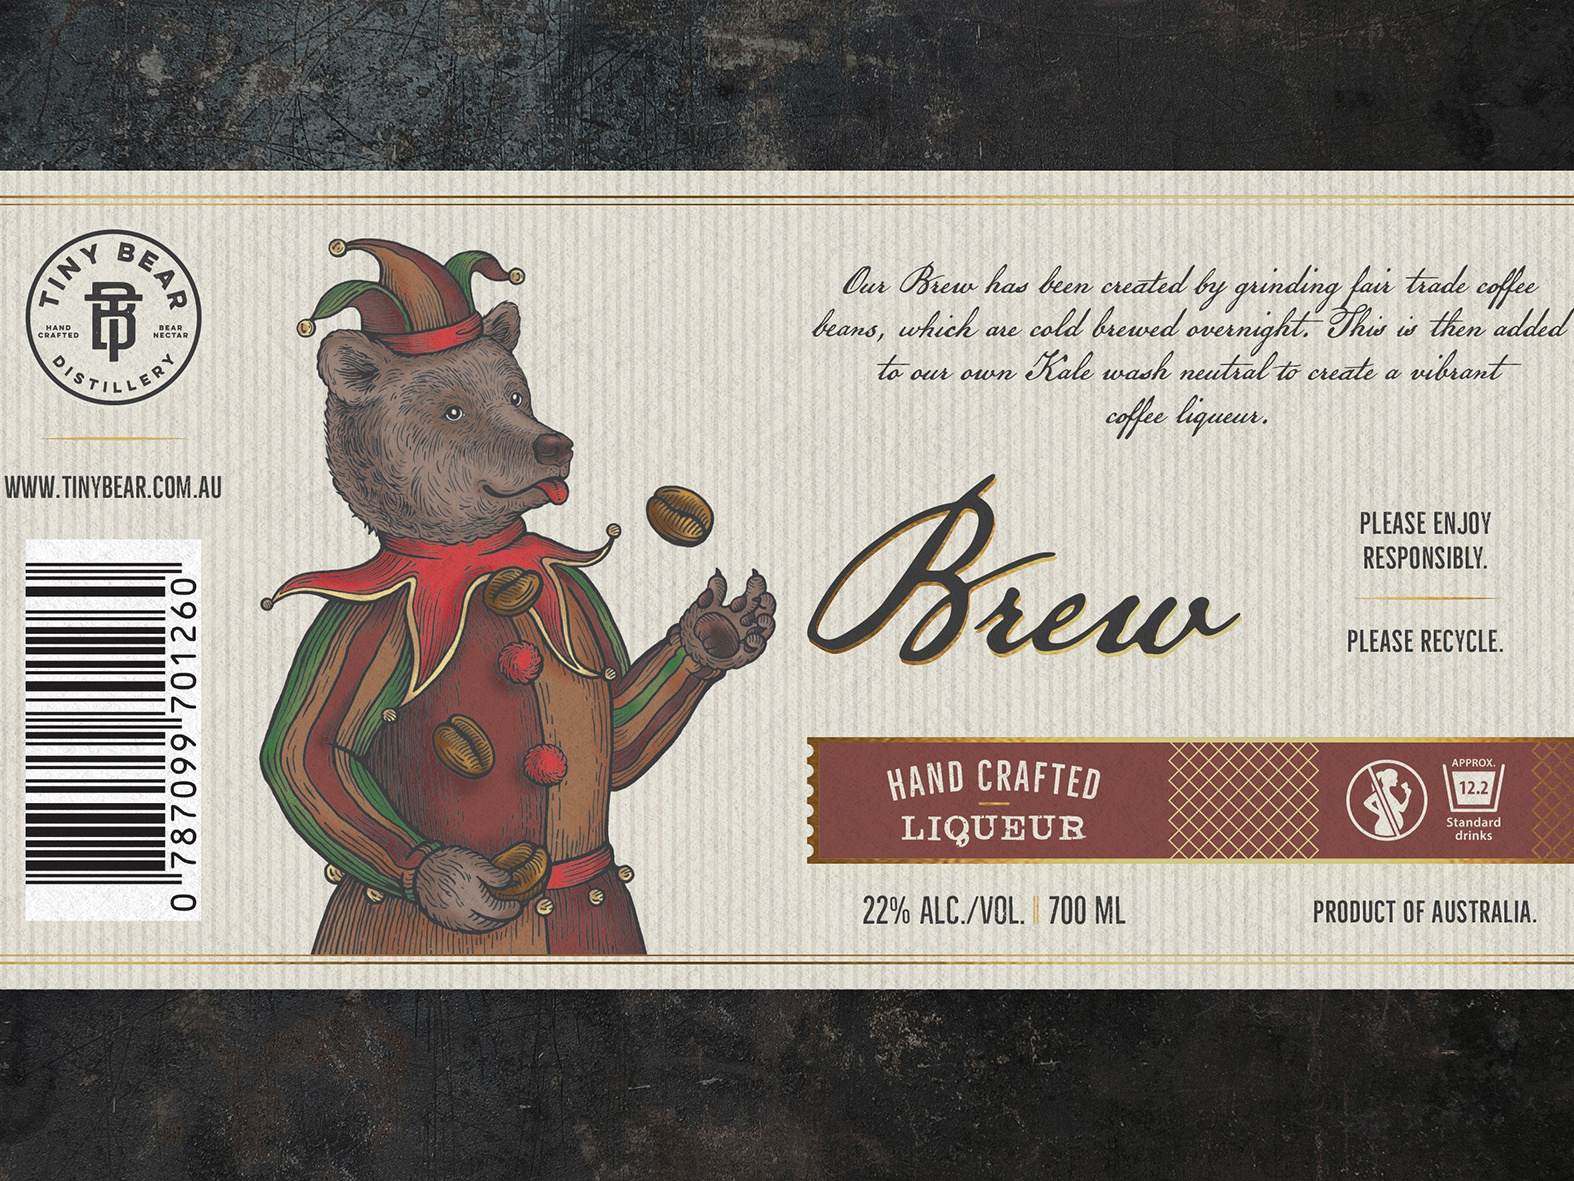 Full label brew